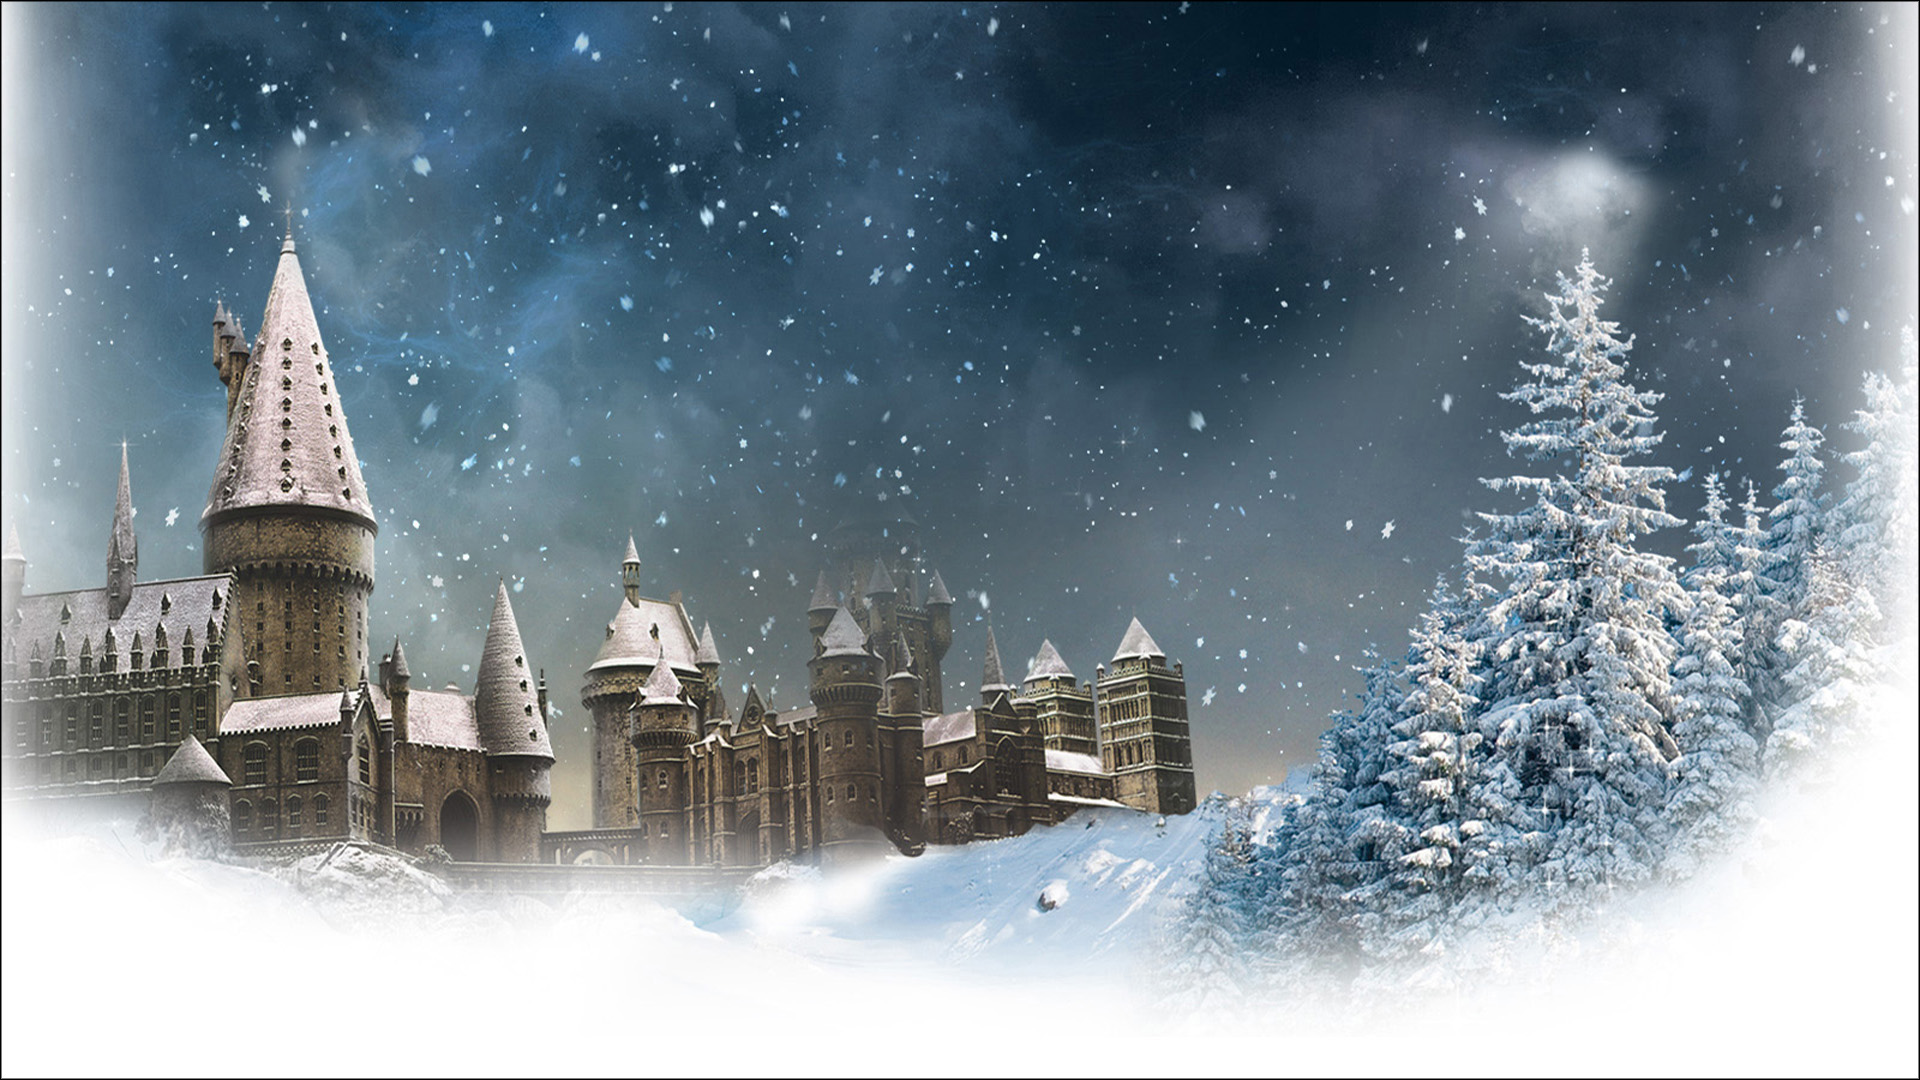 Wonderful Wallpaper Harry Potter Christmas - original  Perfect Image Reference_829150.jpg